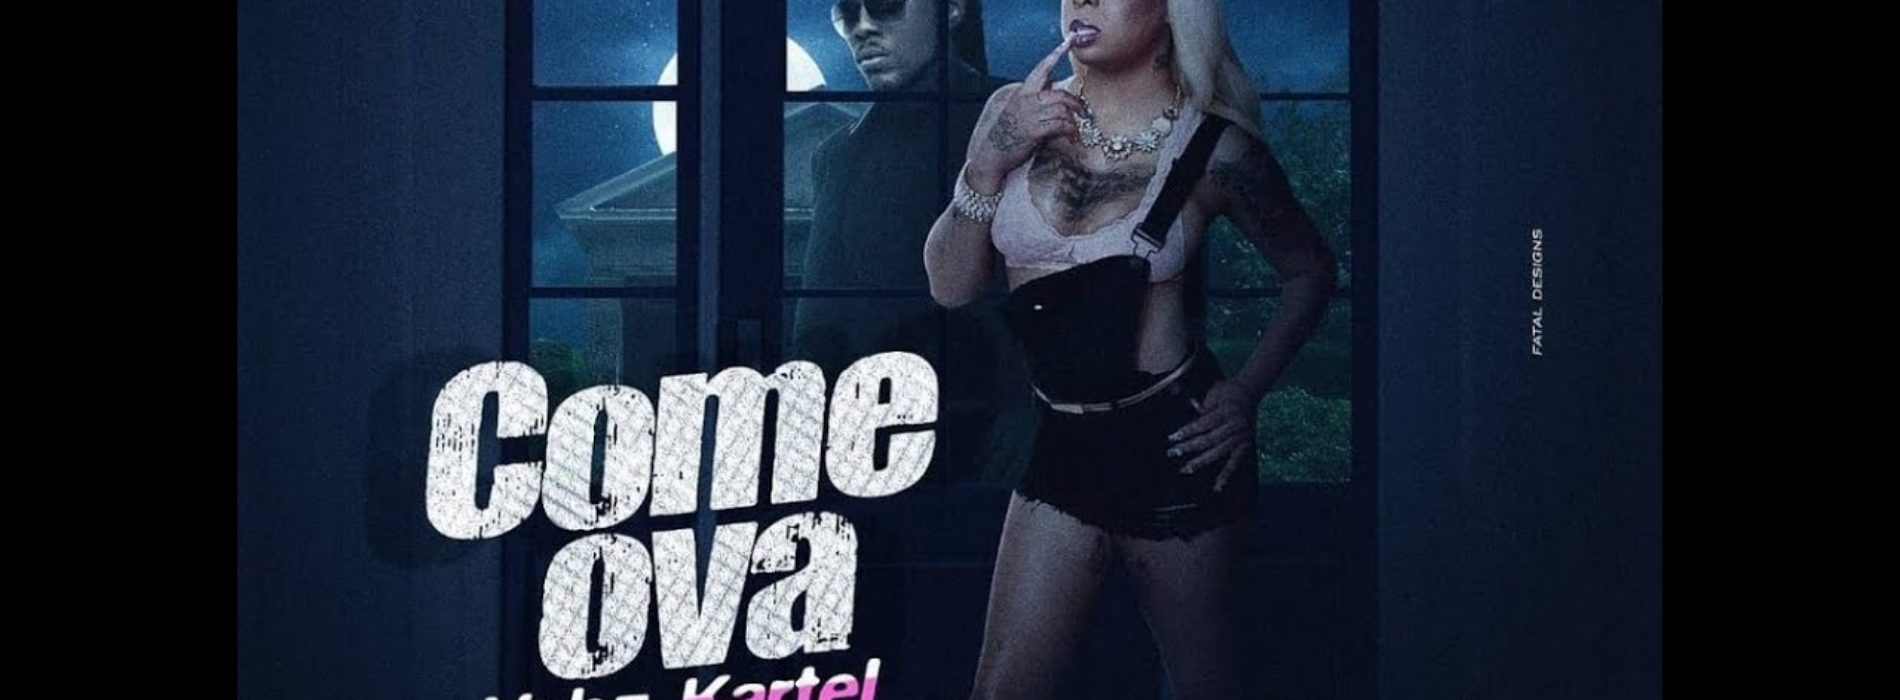 Vybz Kartel – Great (Official Audio) / Vybz Kartel, Lisa Hyper – Come Ova (Official Audio) – Octobre 2019